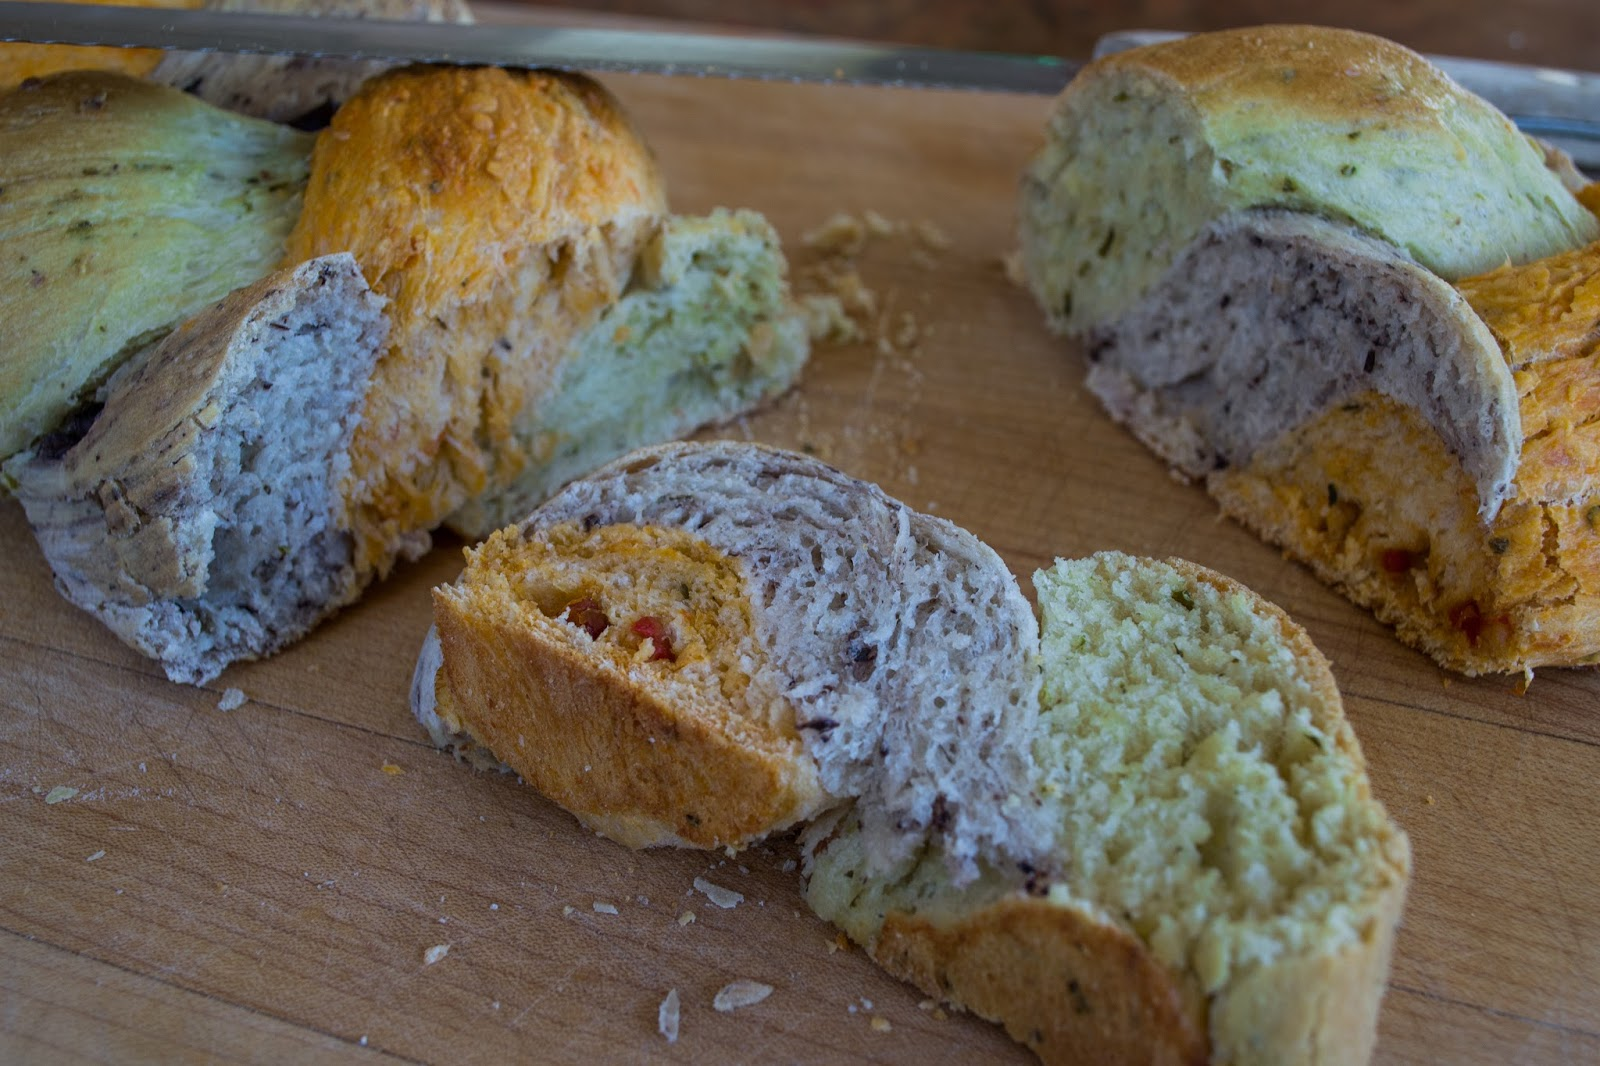 Pesto, sundried tomato, kalamata olive bread